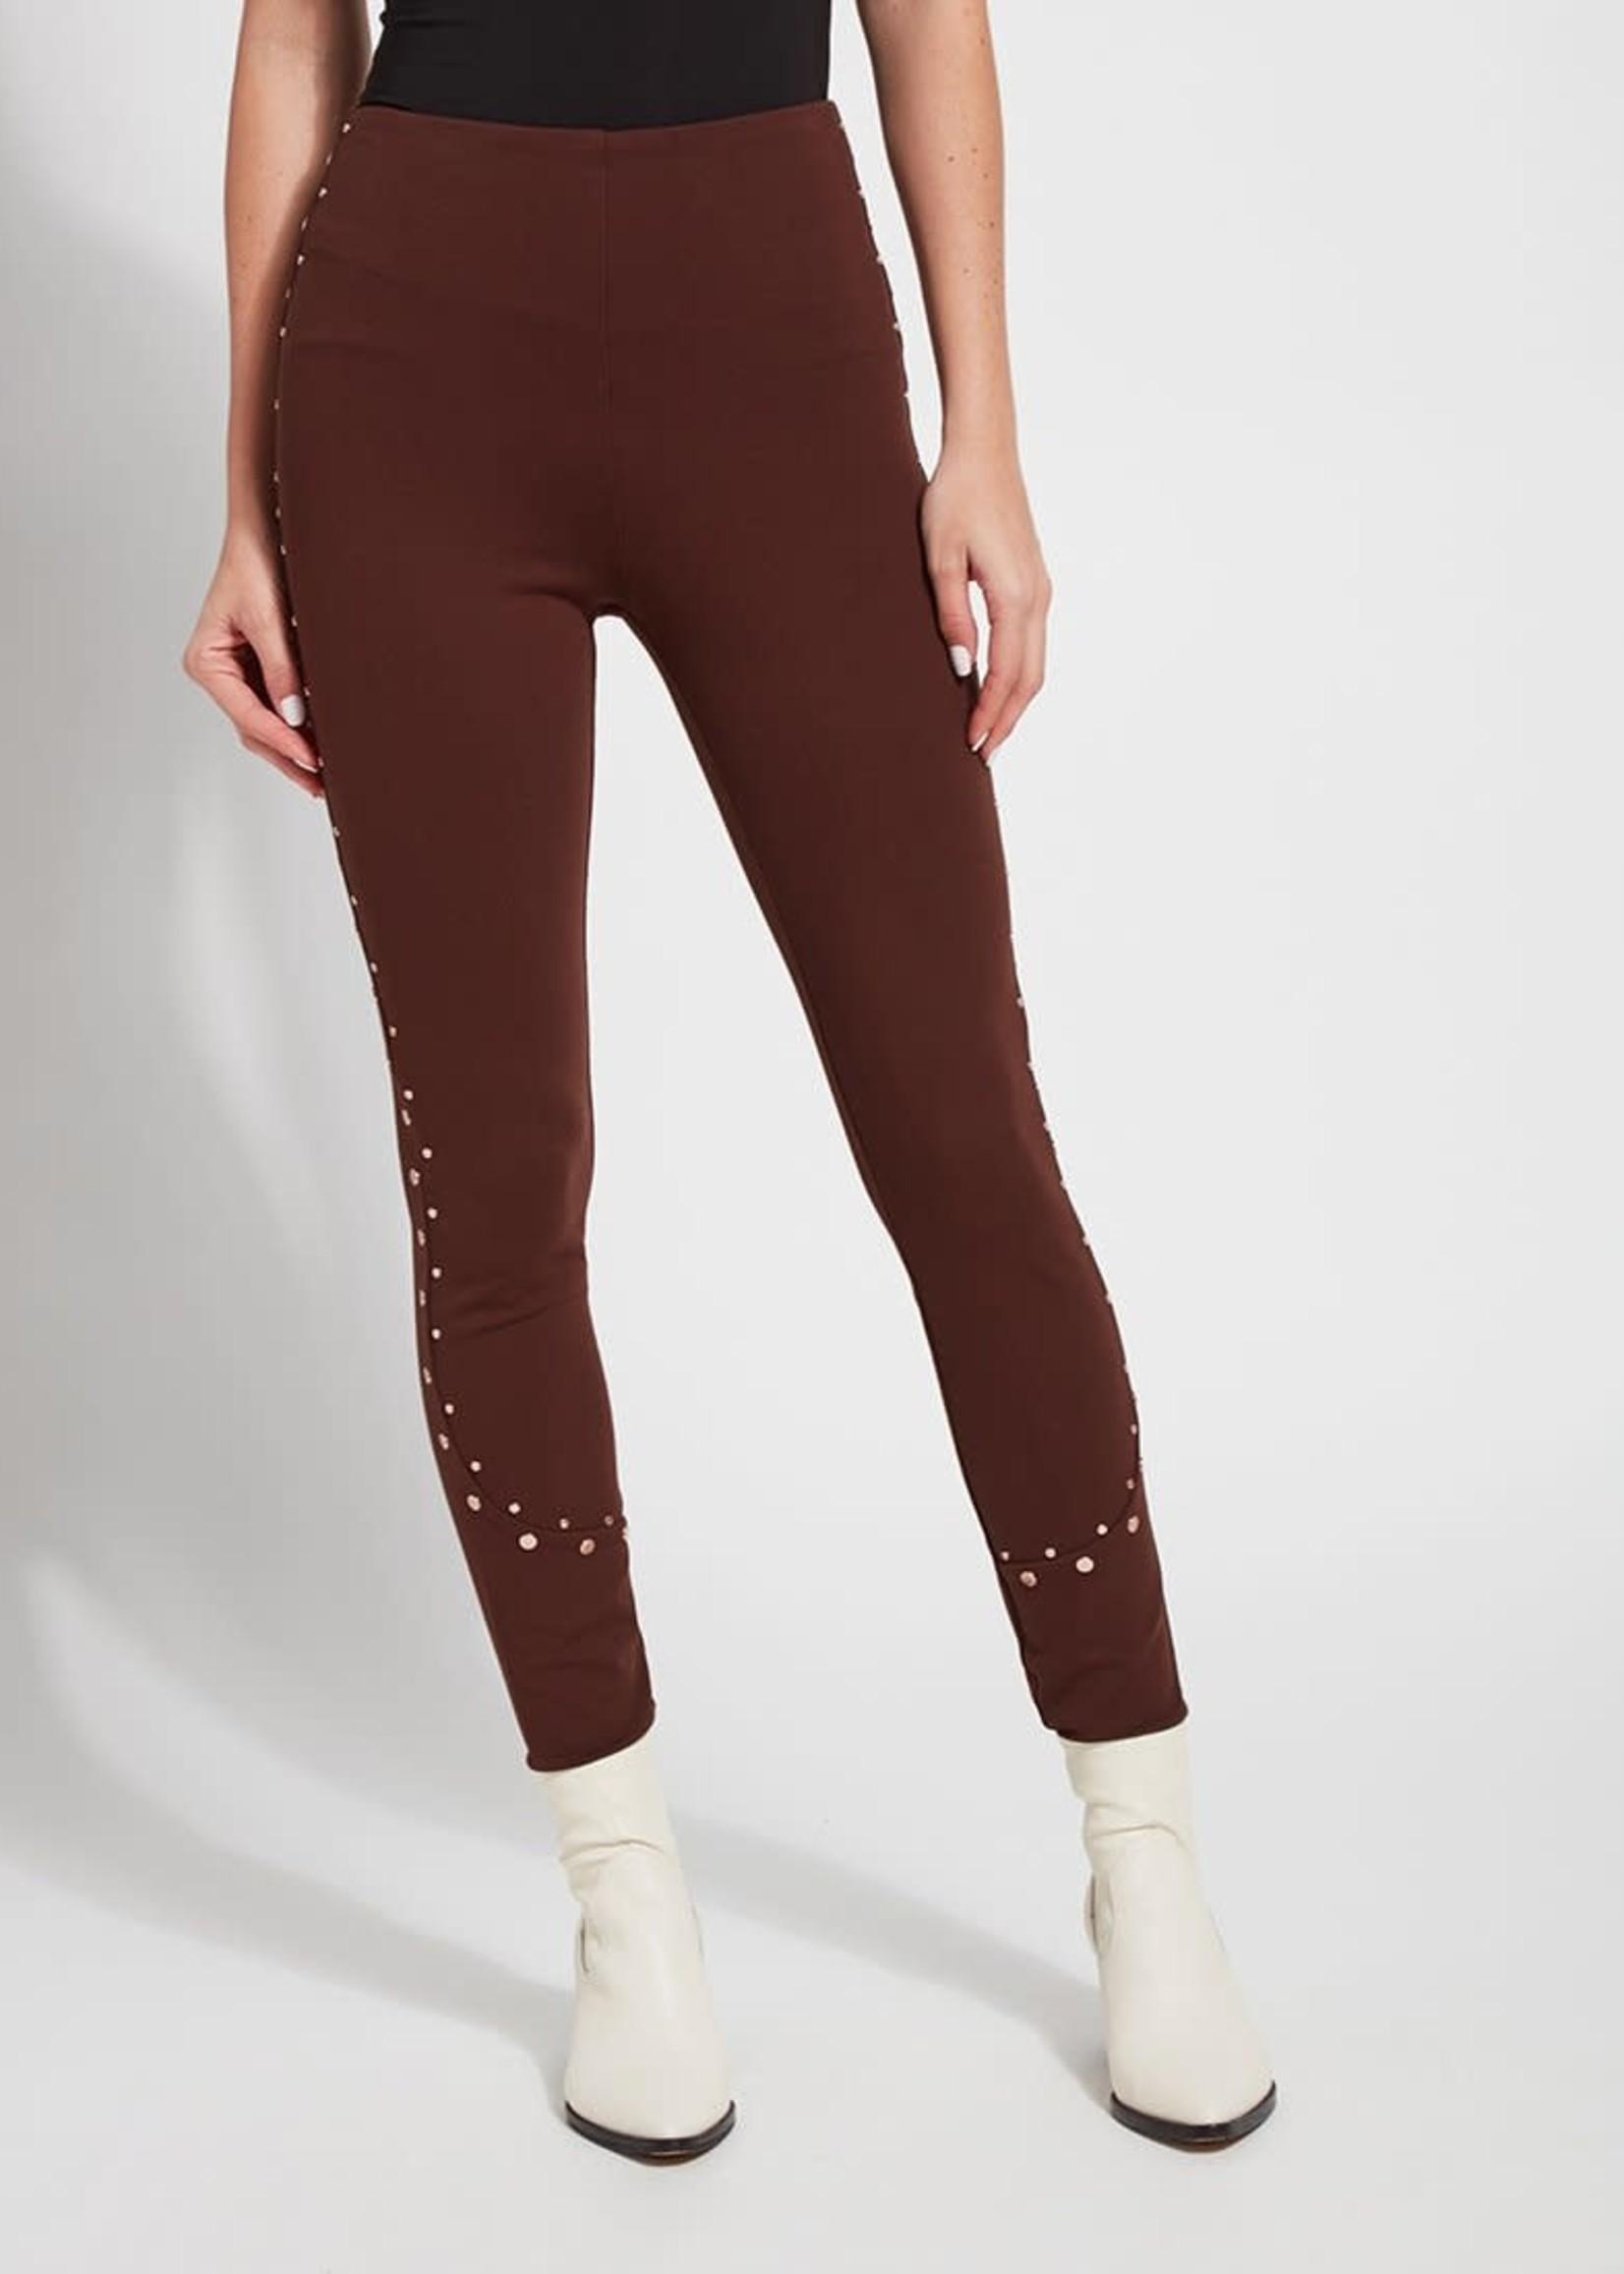 Silka Studded Legging